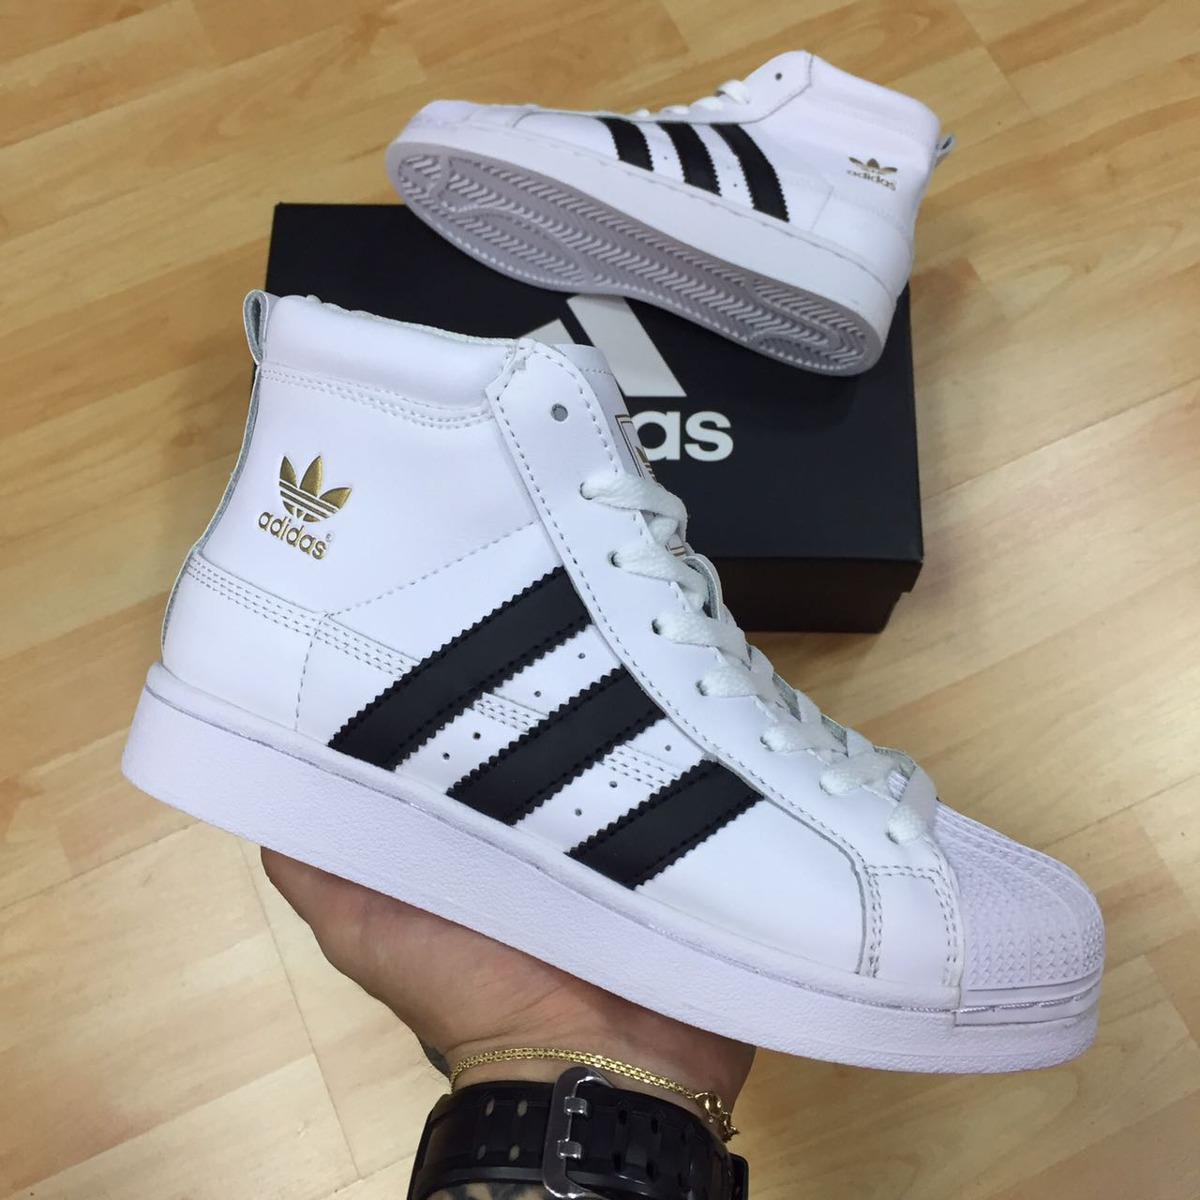 9891ab051 adidas superstar bota blanca. Cargando zoom.